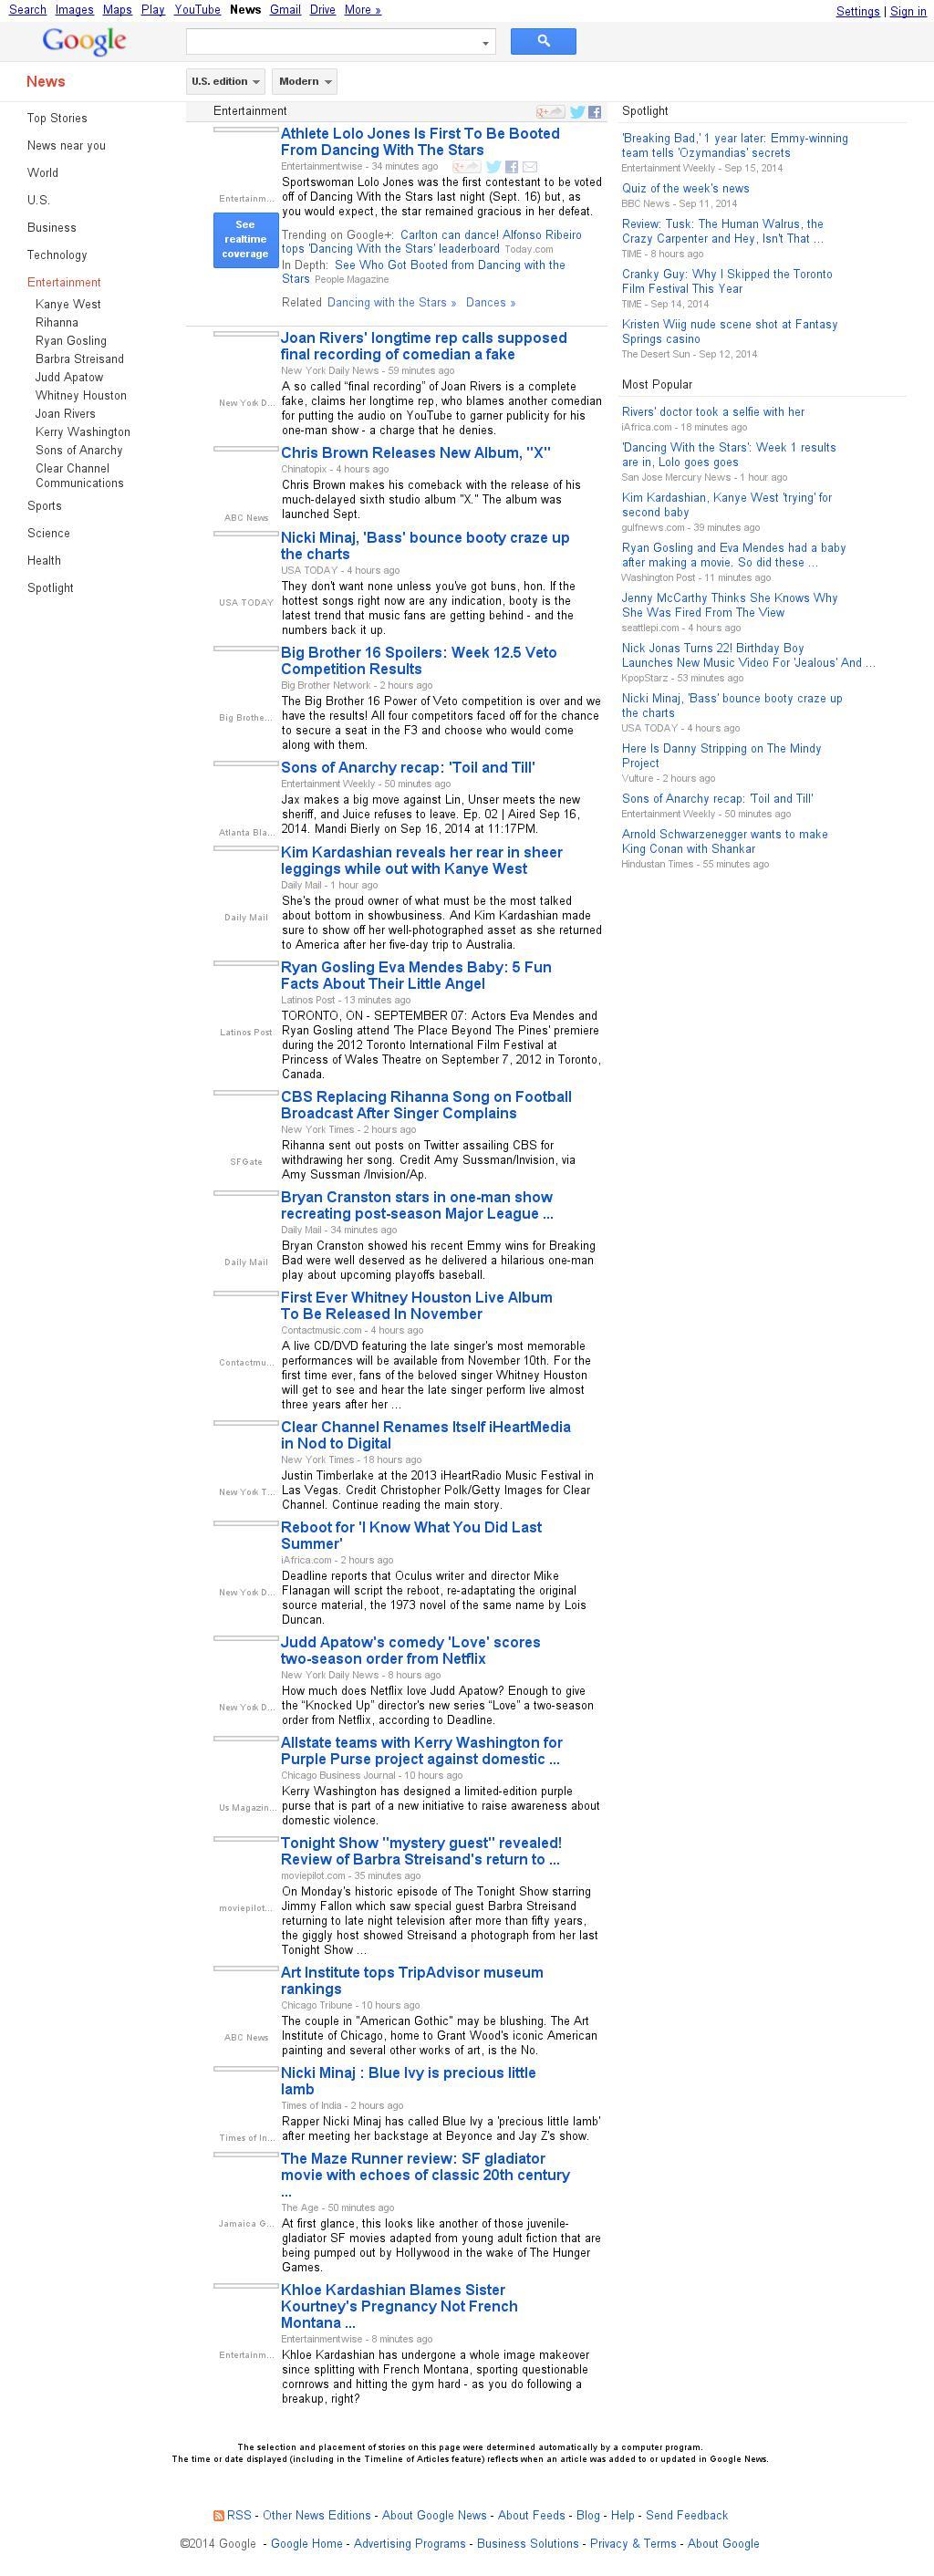 Google News: Entertainment at Wednesday Sept. 17, 2014, 7:07 a.m. UTC